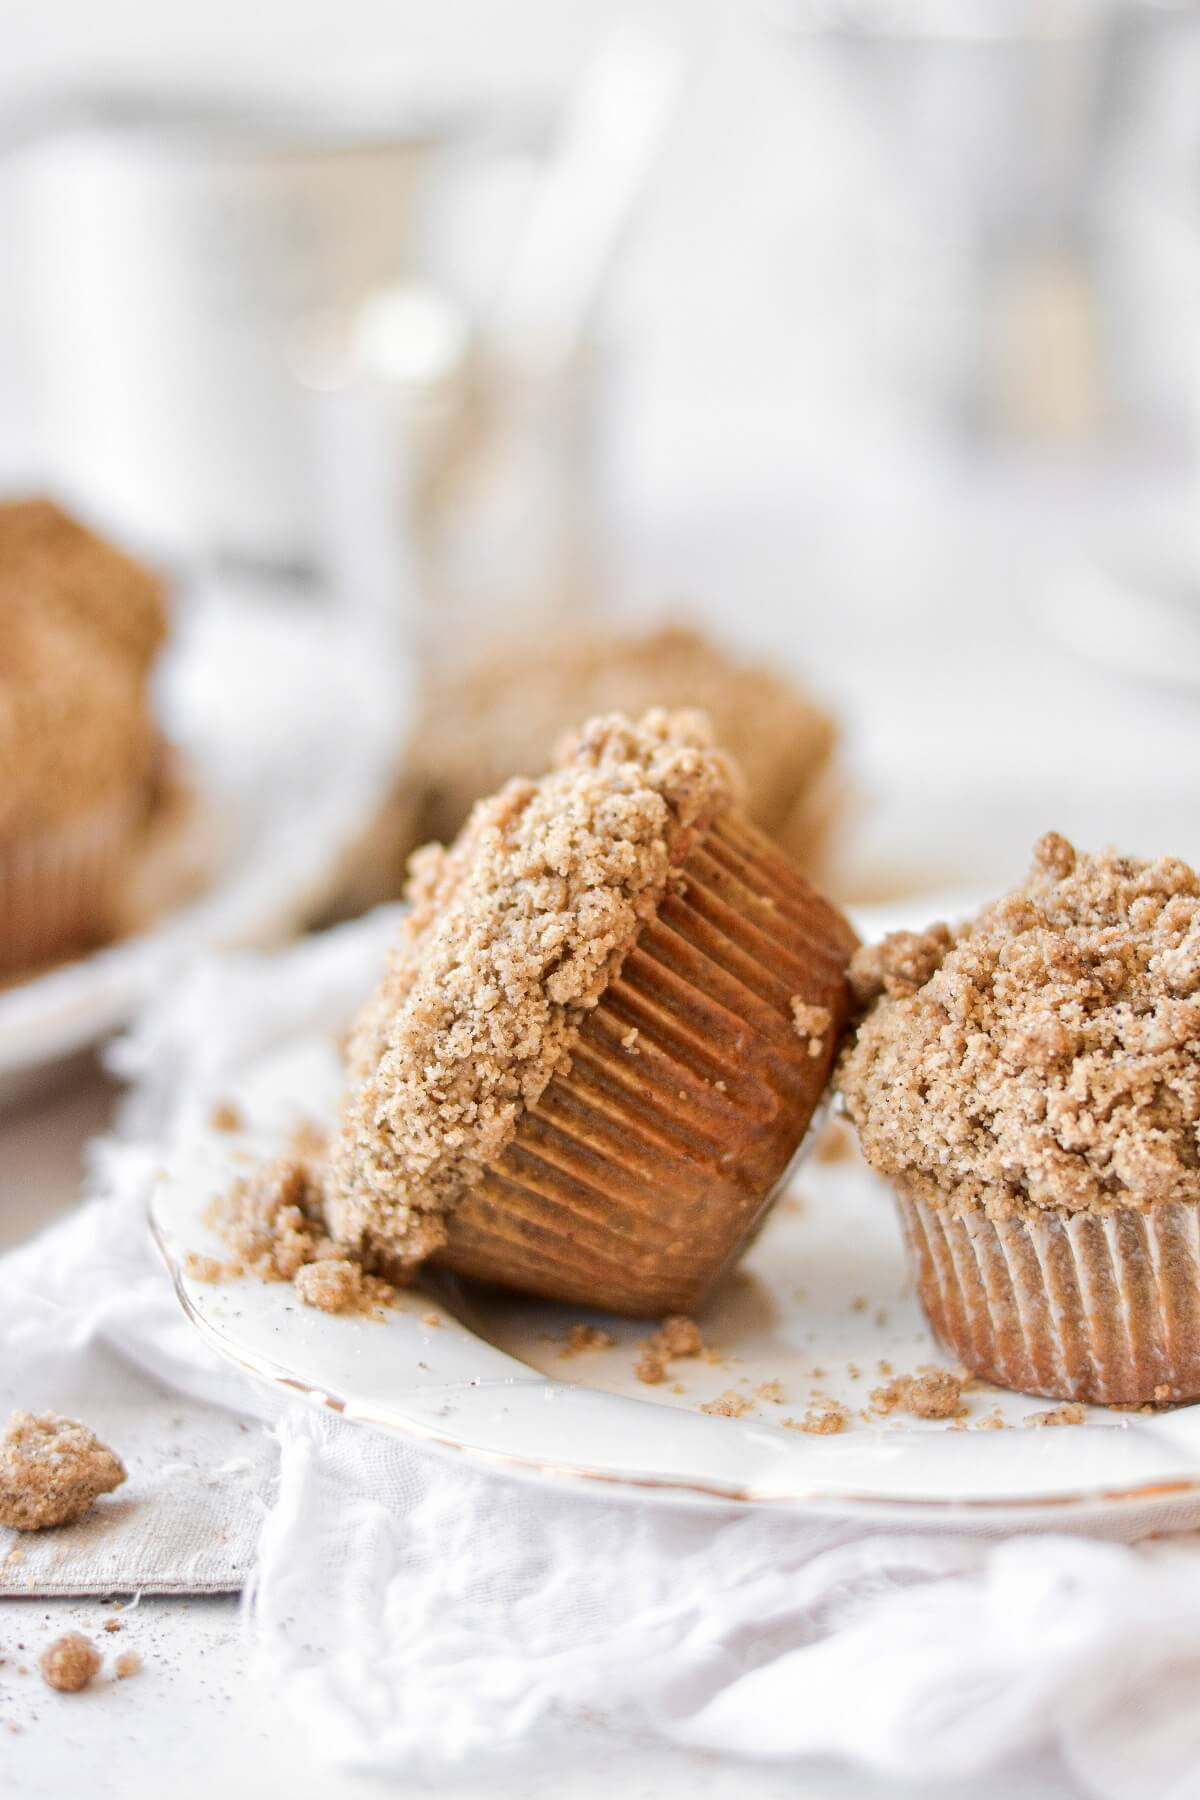 Espresso coffeecake muffins on a white plate.